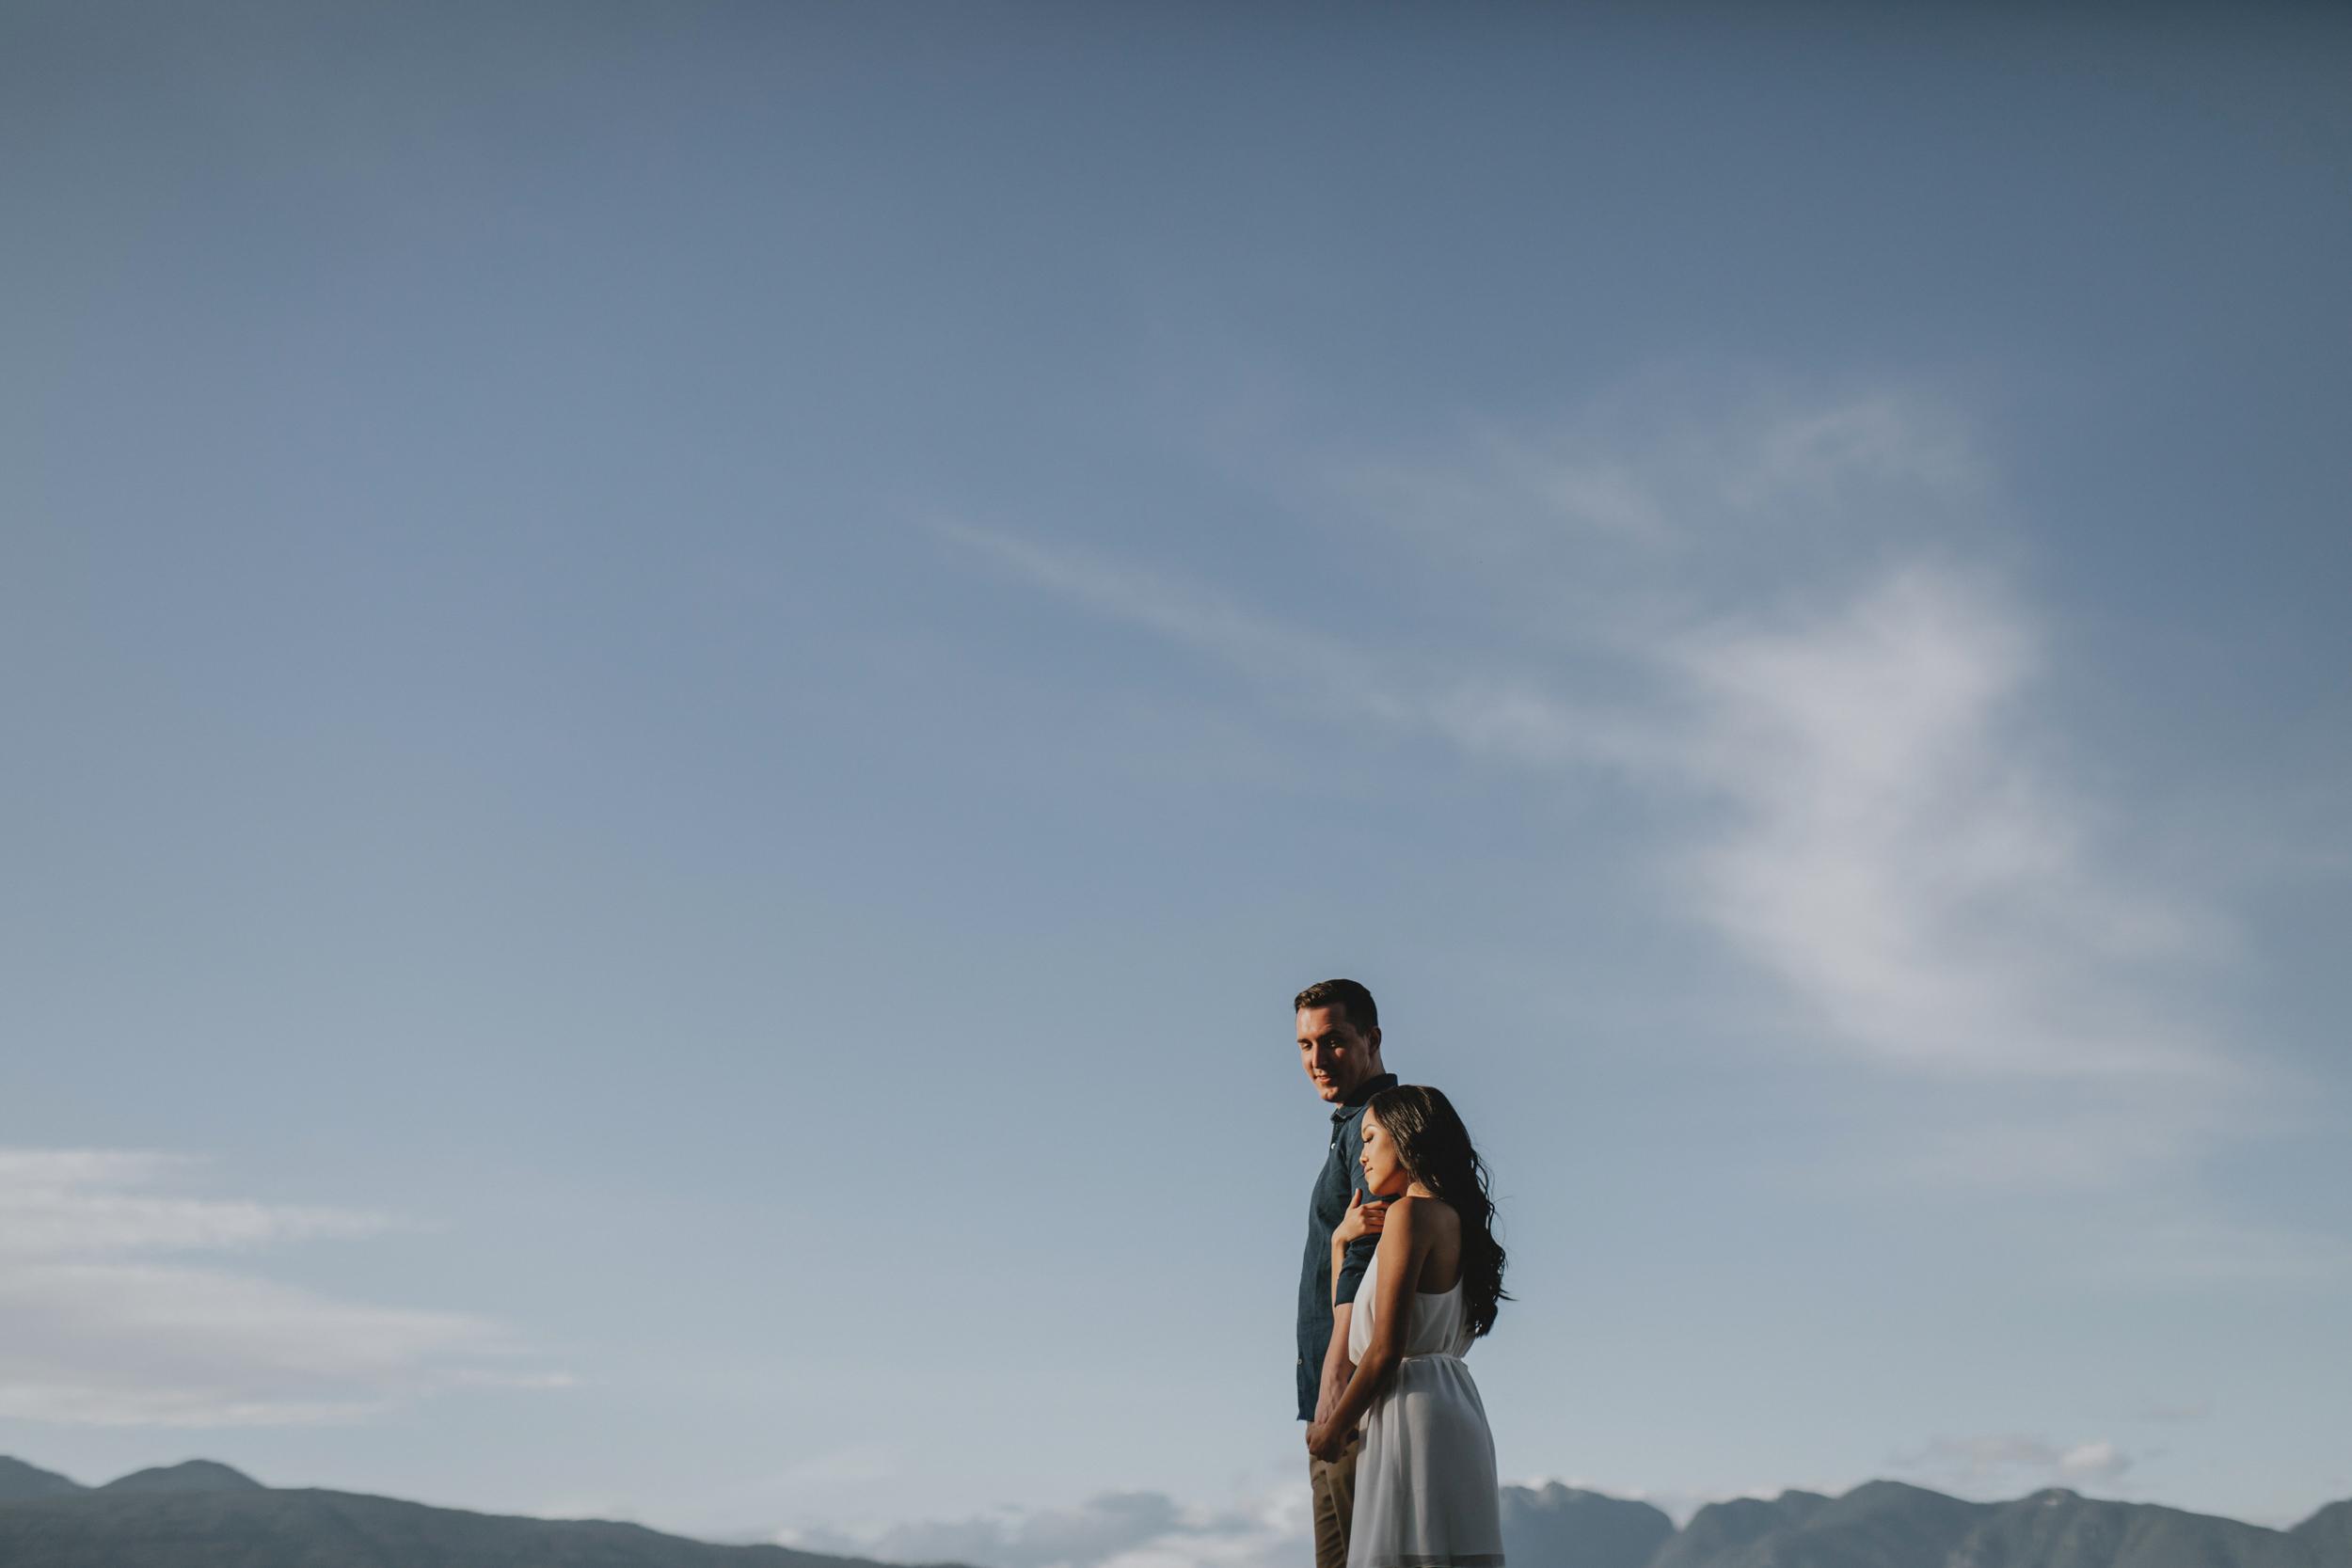 Jericho-Beach-Engagement-Vancouver-4.jpg